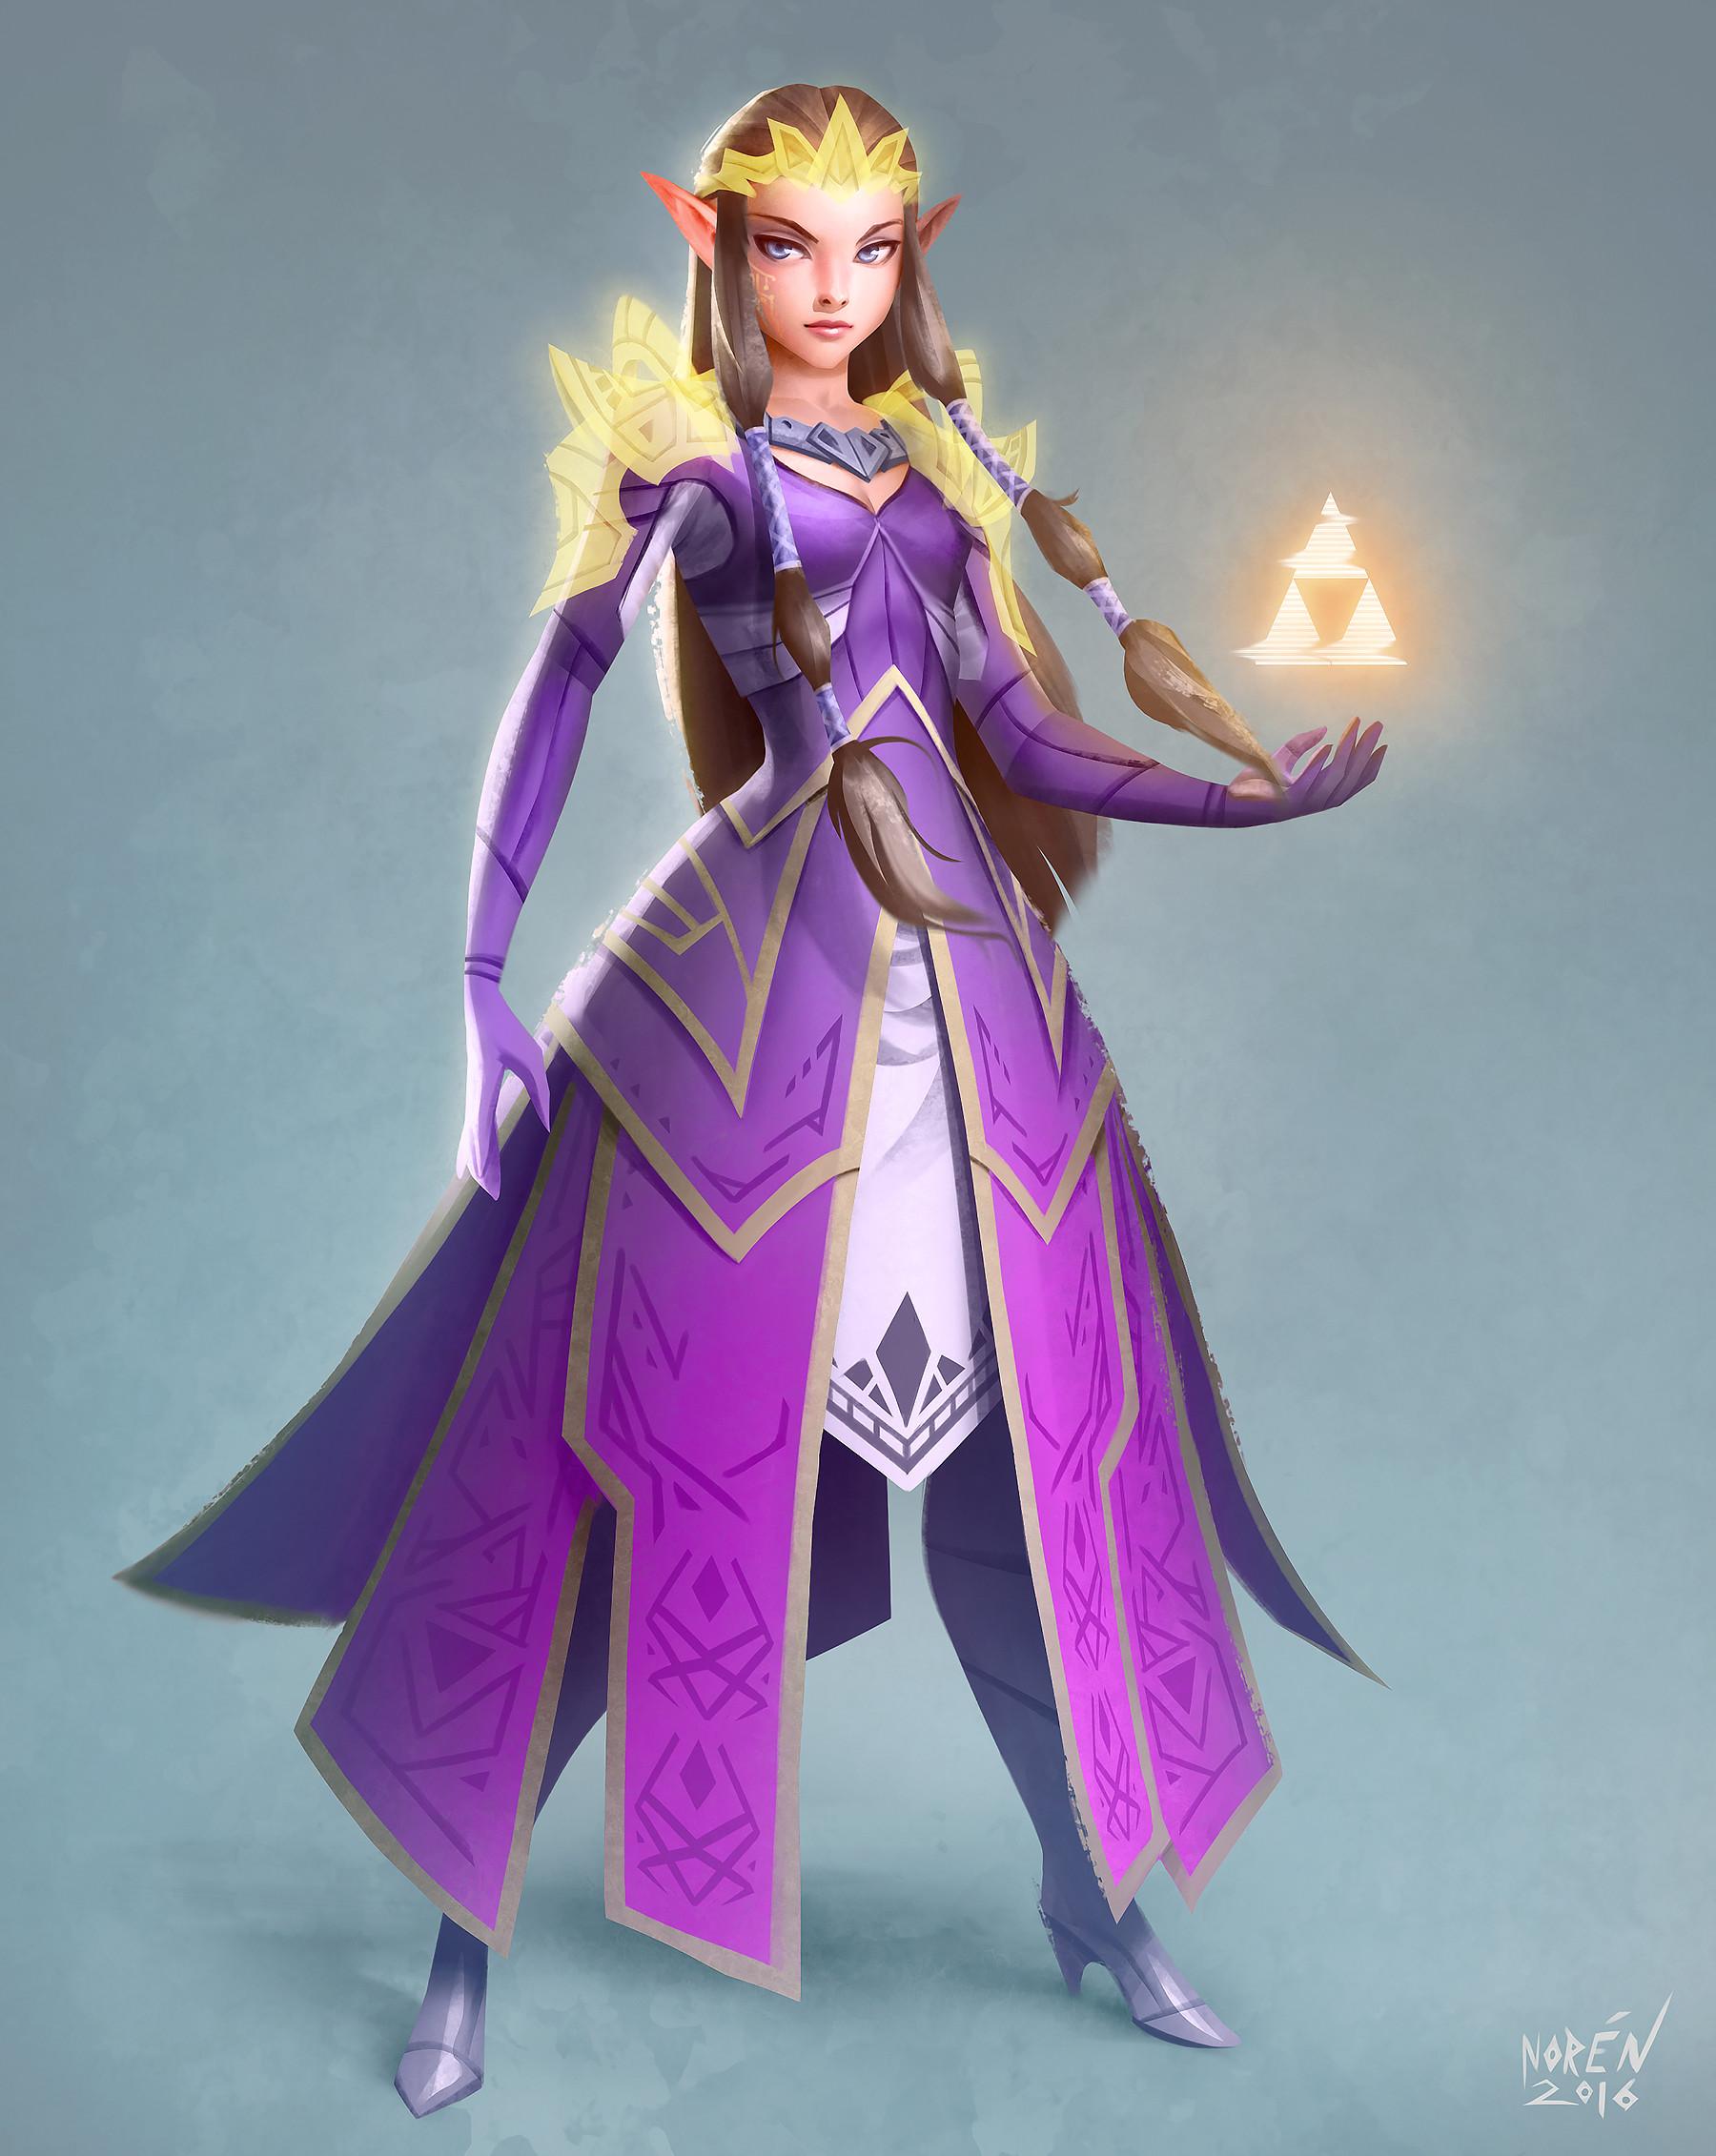 Zelda Ocarina Of Time 3d Wallpaper Artstation Princess Zelda Magnus Nor 233 N